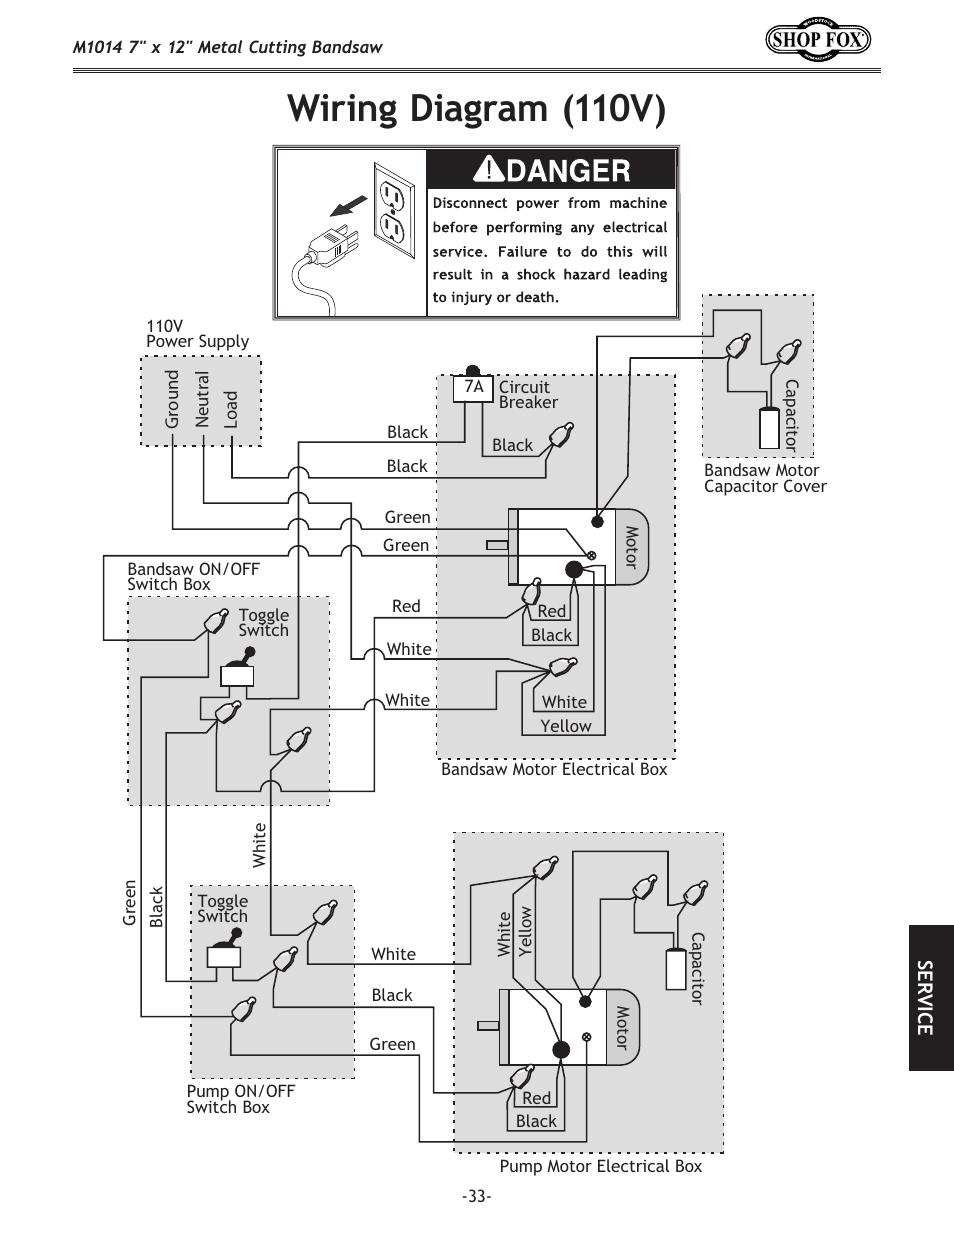 Wiring Diagram  110v